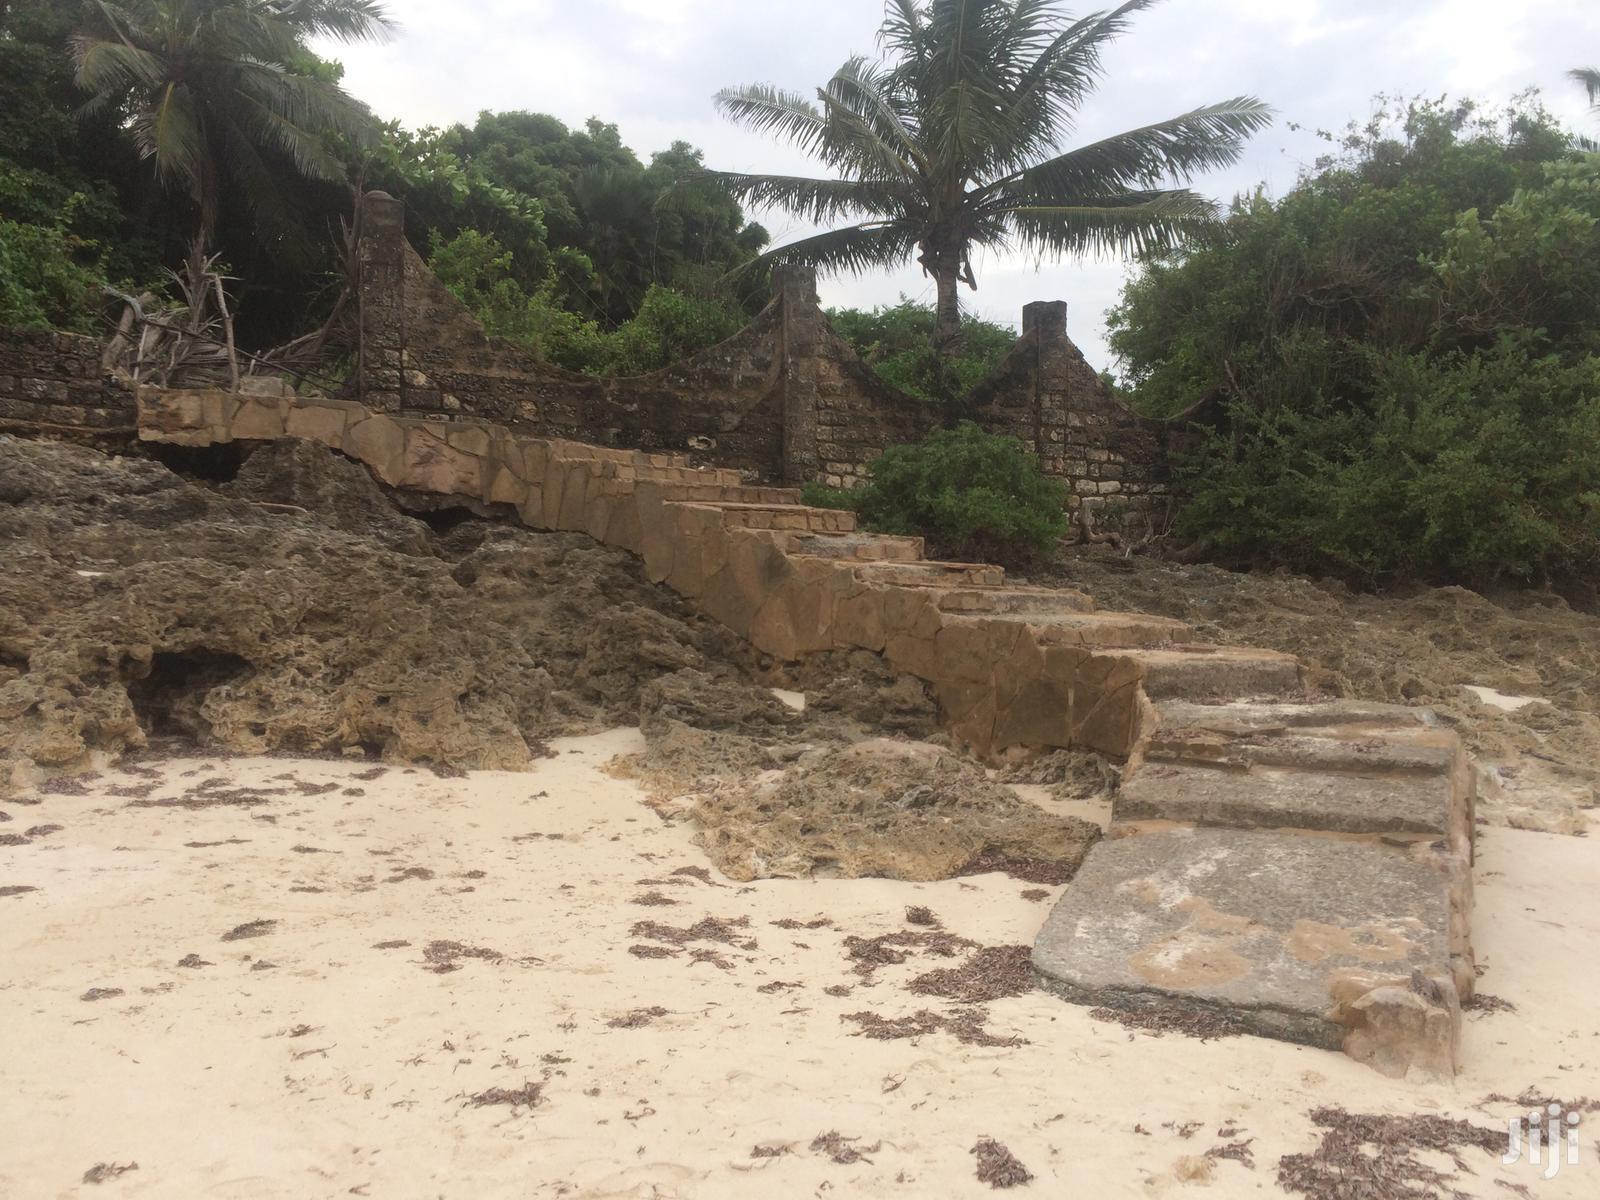 Beach Plot for Sale in Diani   Land & Plots For Sale for sale in Ukunda, Kwale, Kenya